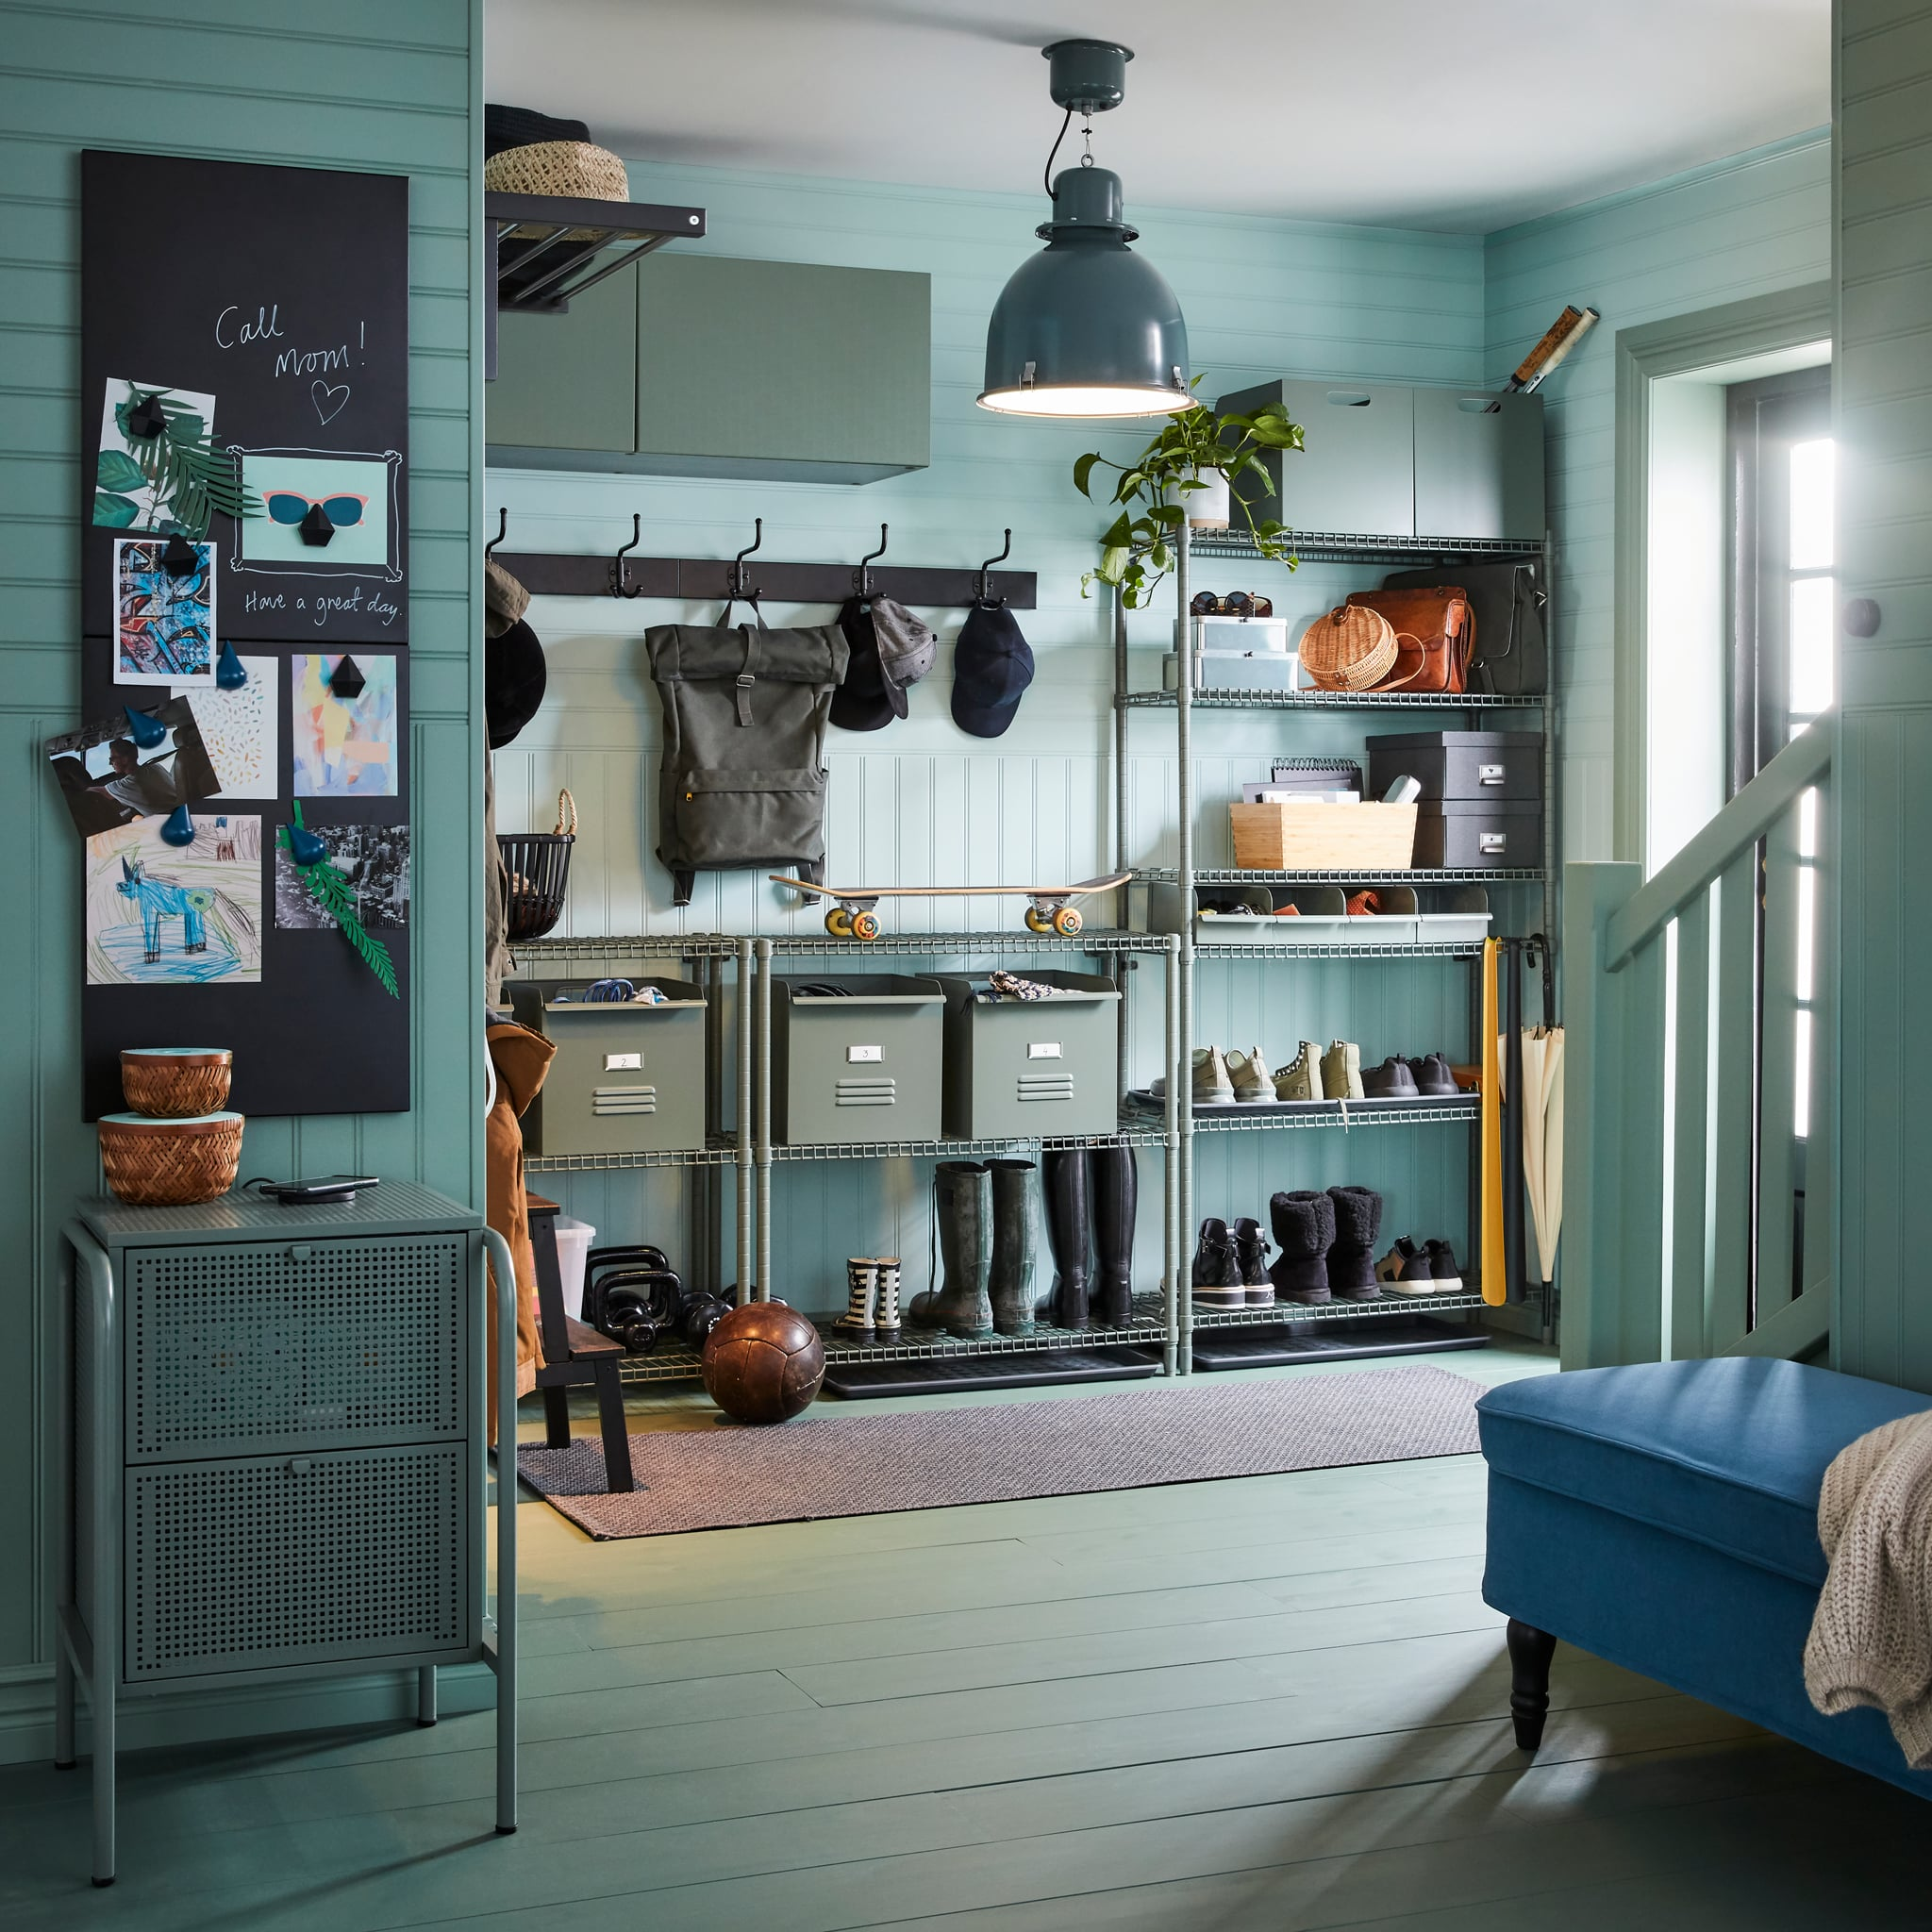 Harmonic and helpful hallway ideas